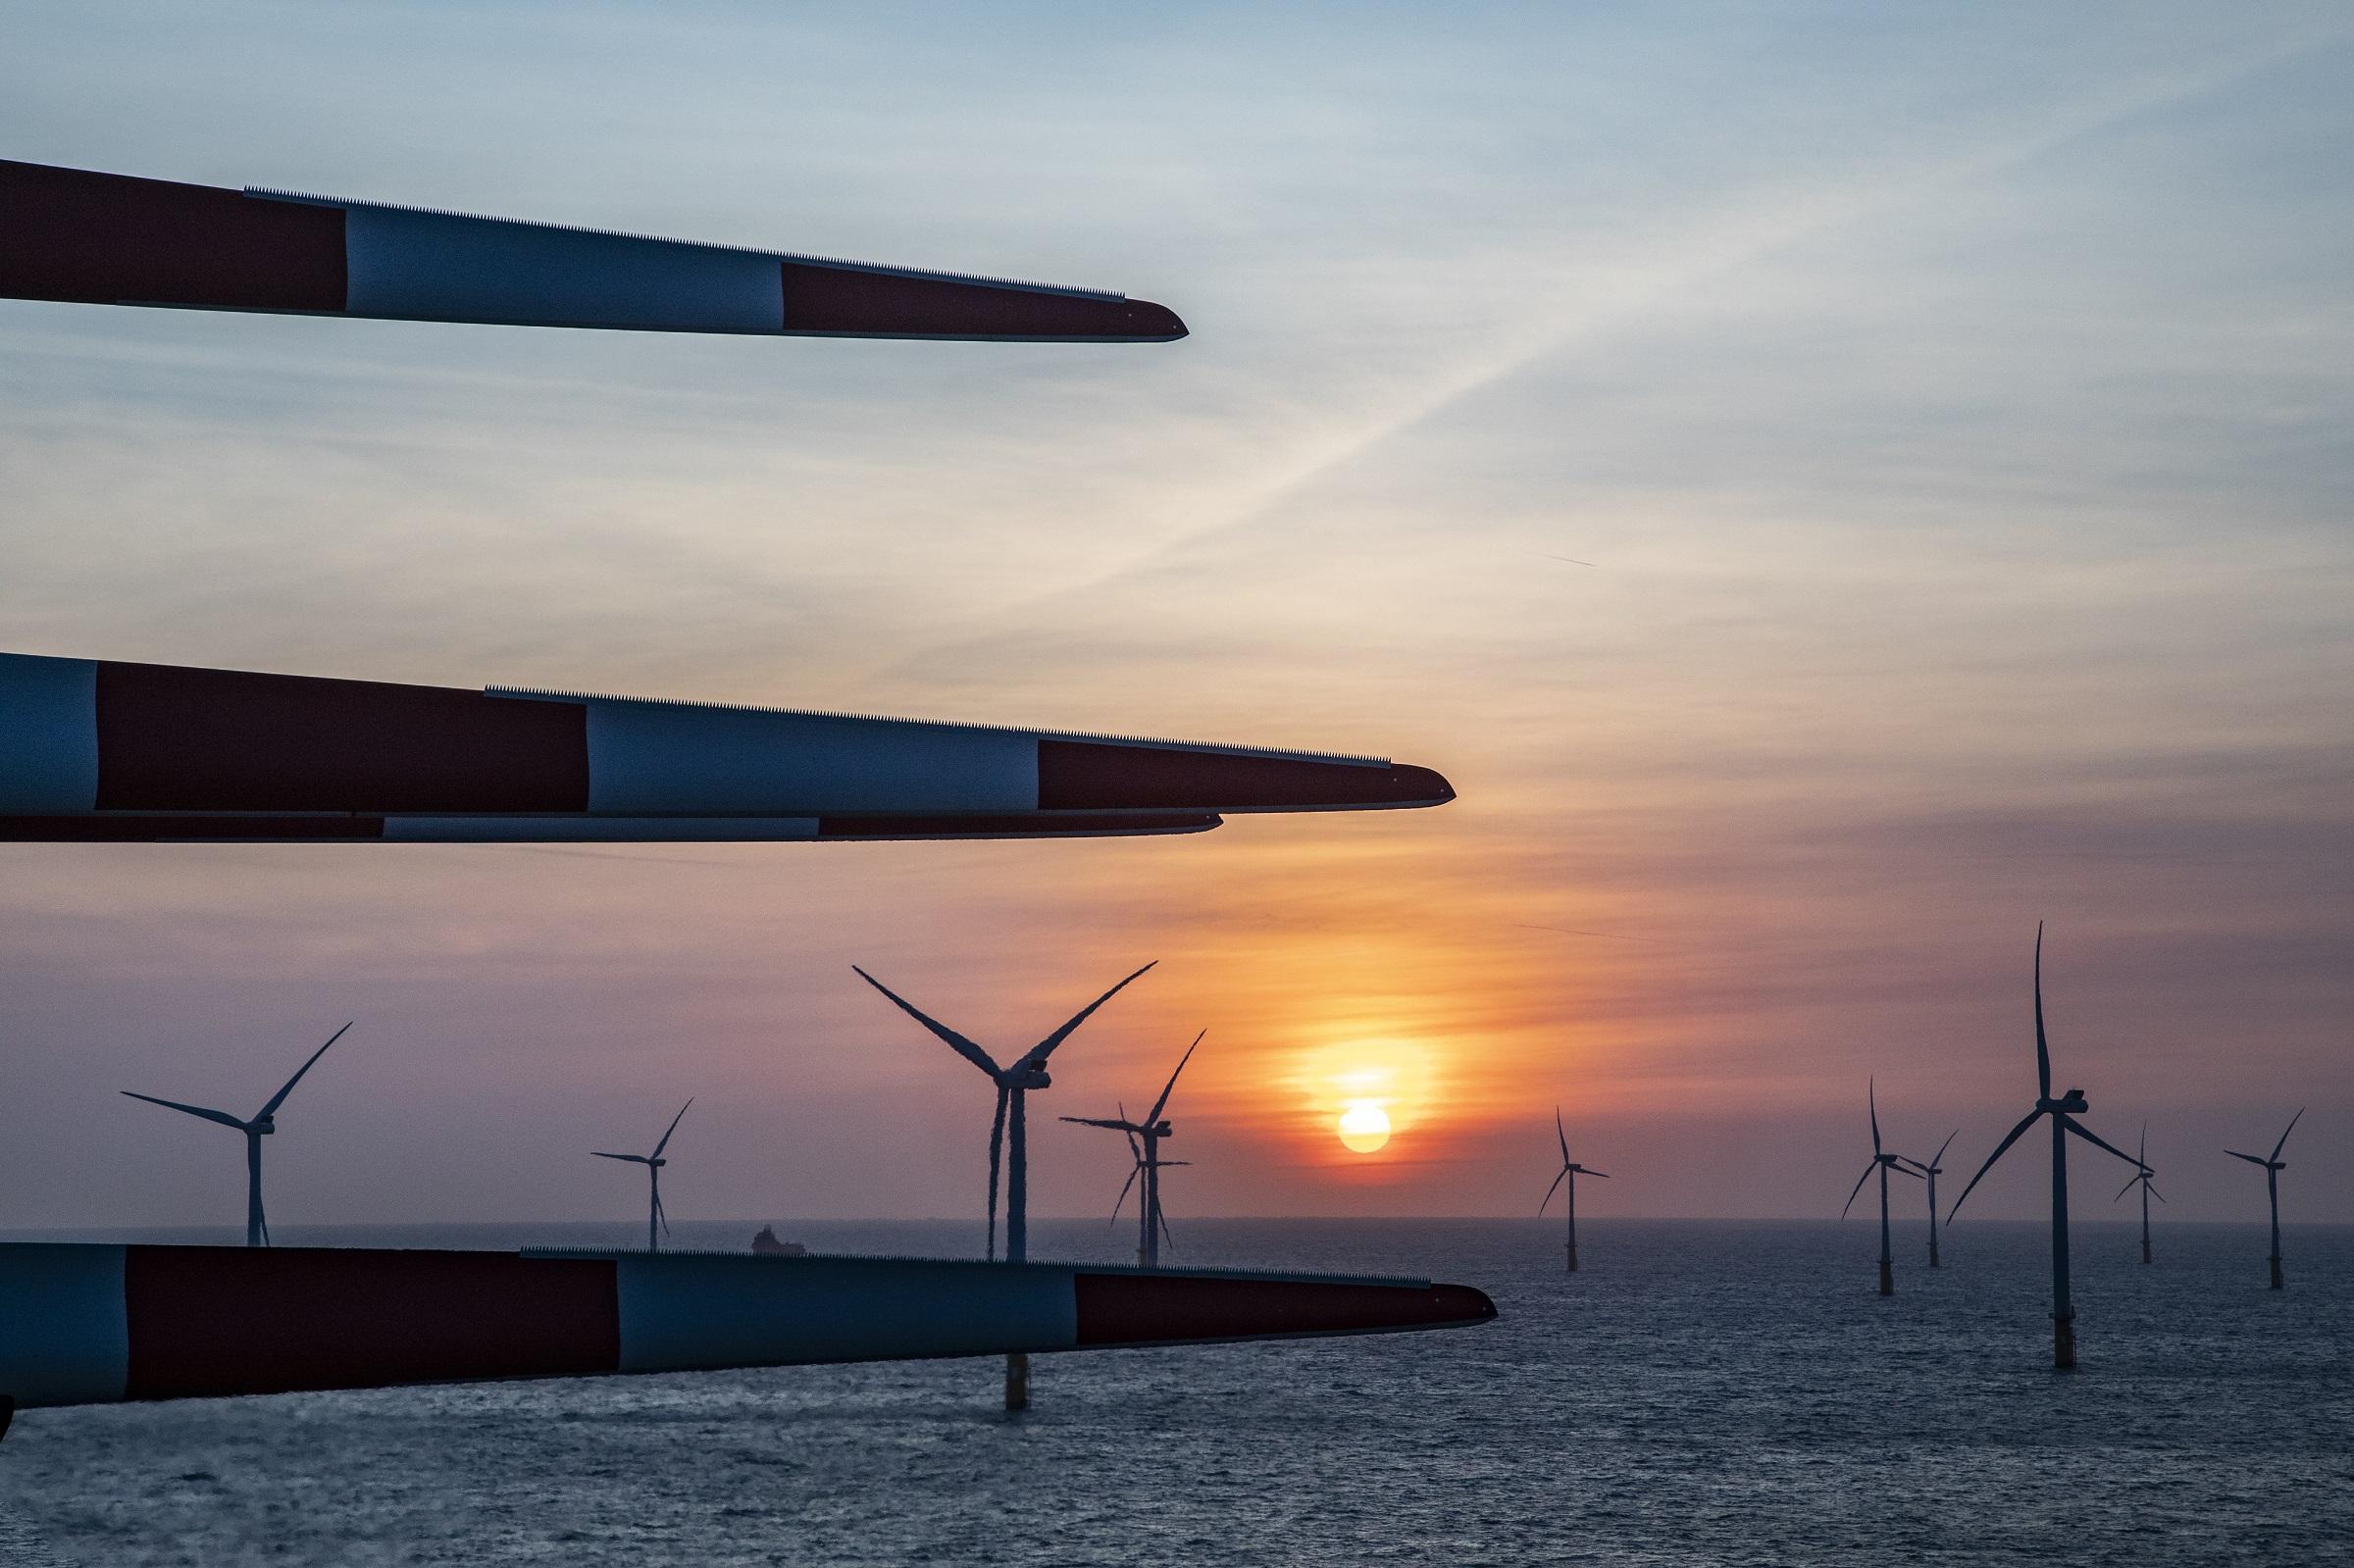 DEME, Qair, and Aspiravi to bid into Scottish offshore wind leasing round